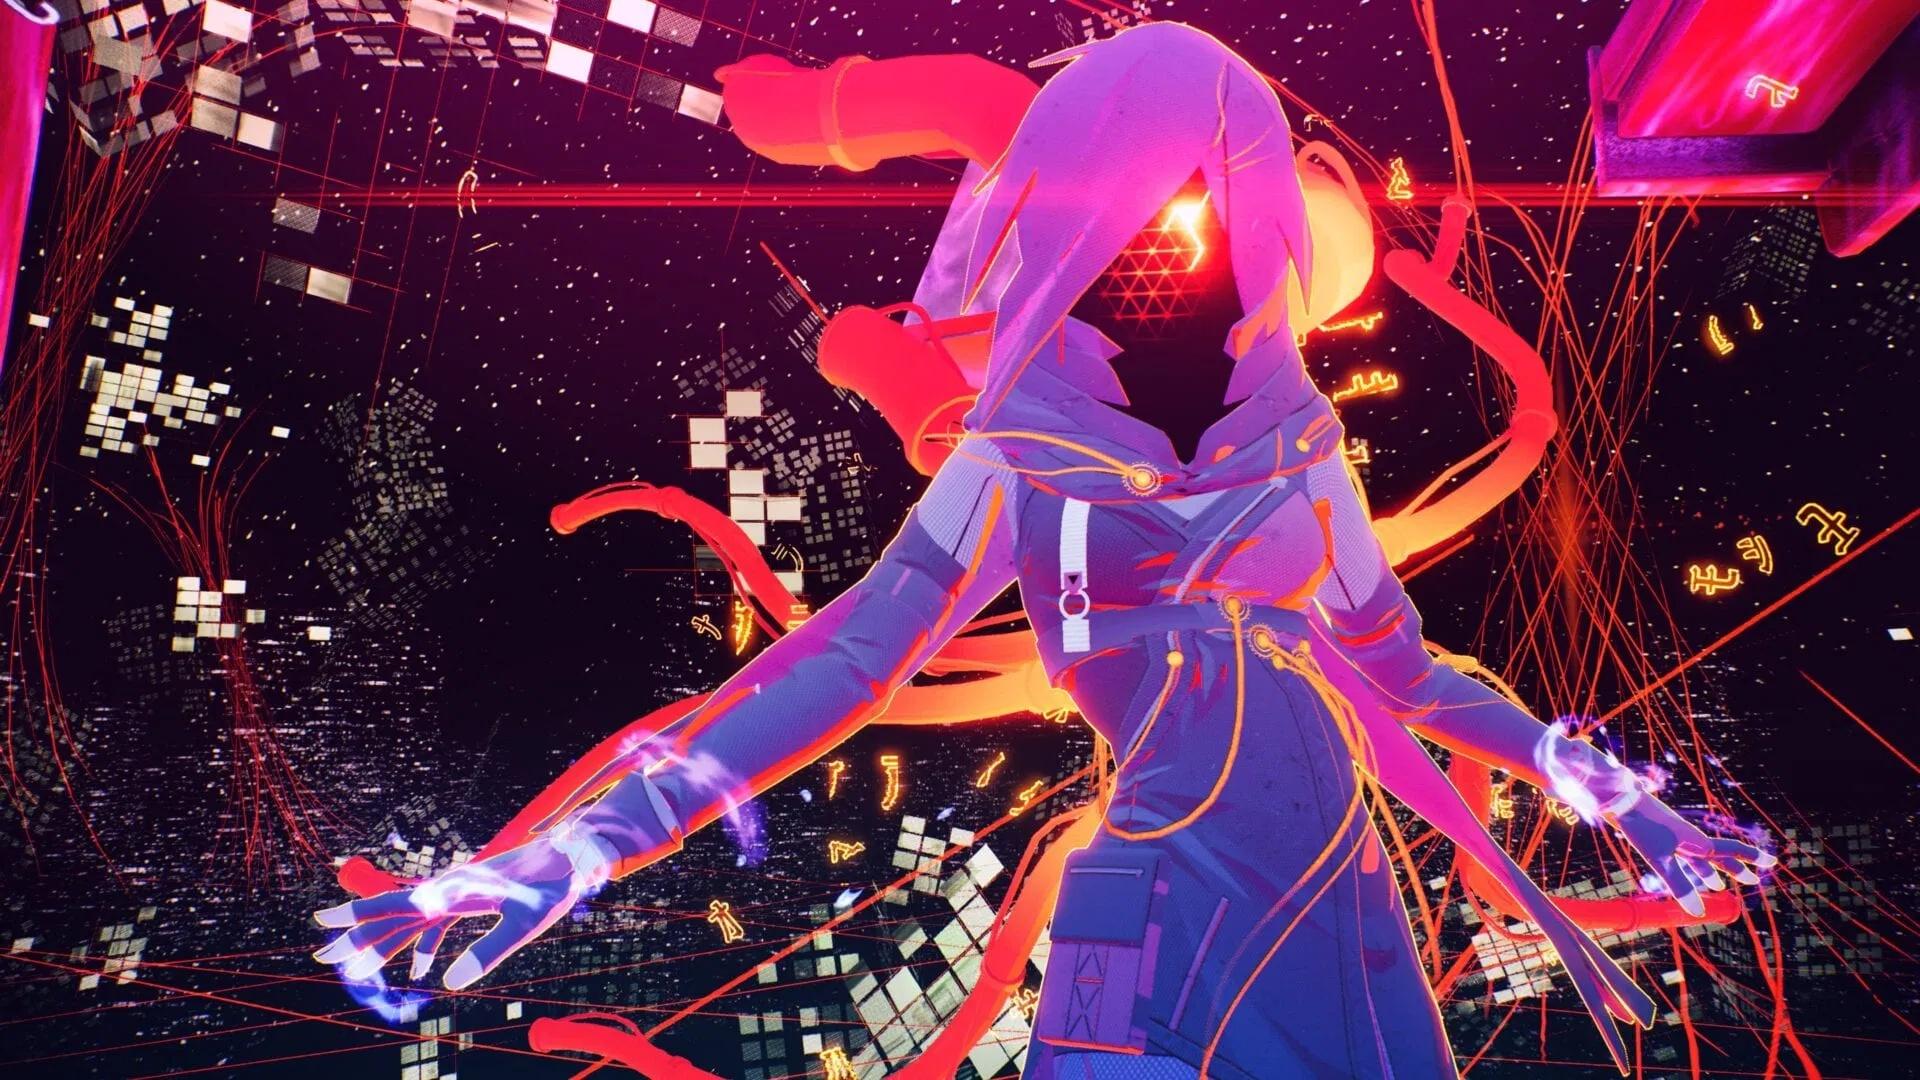 Scarlet Nexus free background